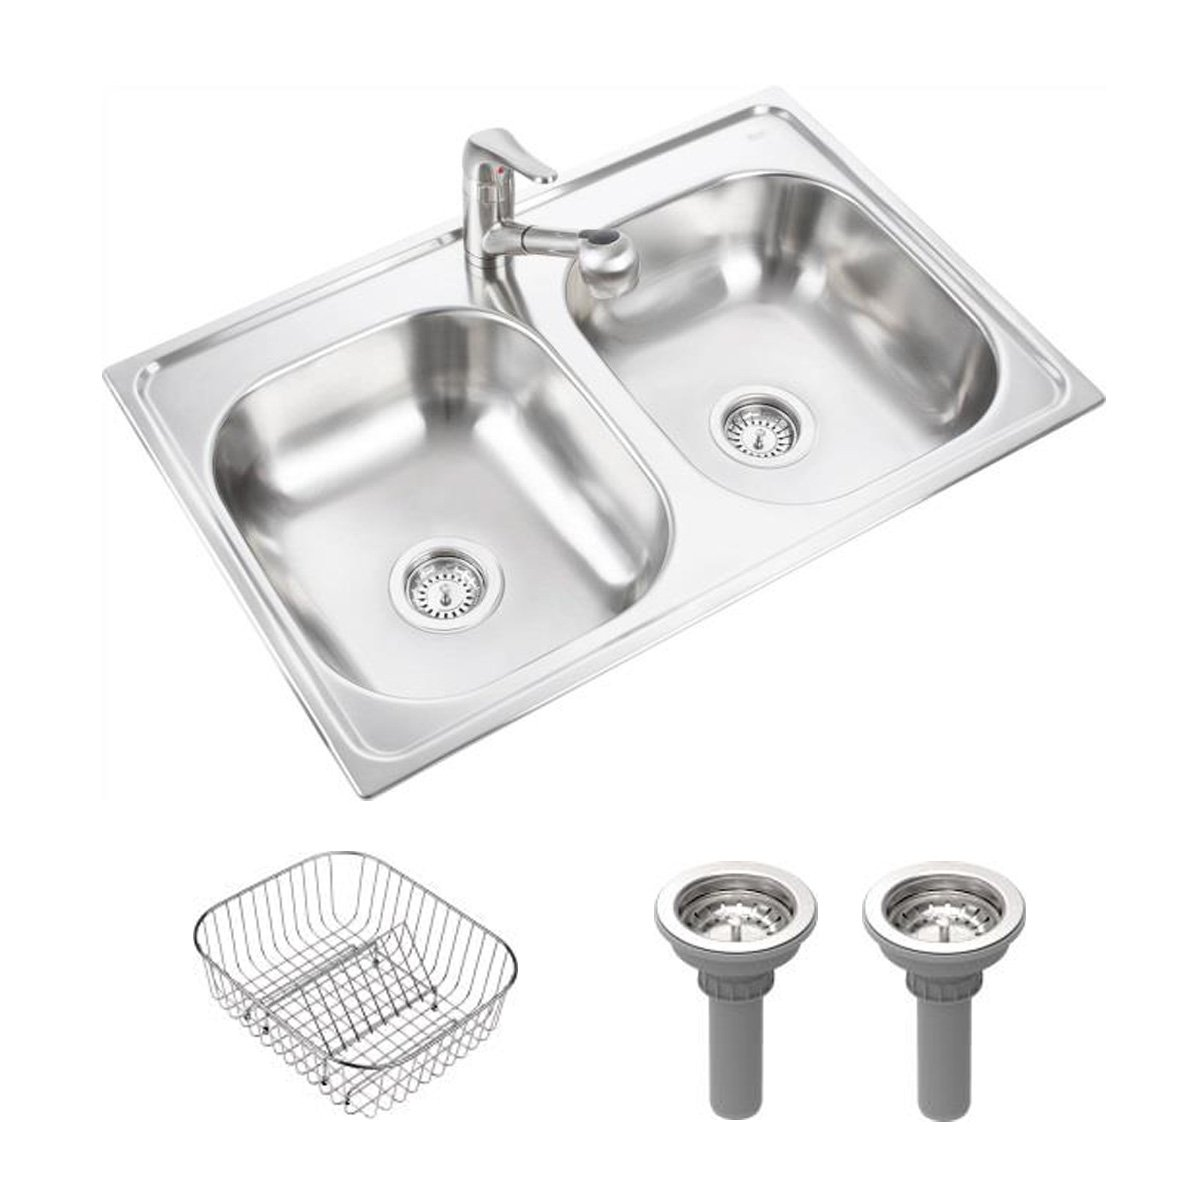 Tarja con accesorios paquete tekaway 2c 7 mj - Teka accesorios cocina ...